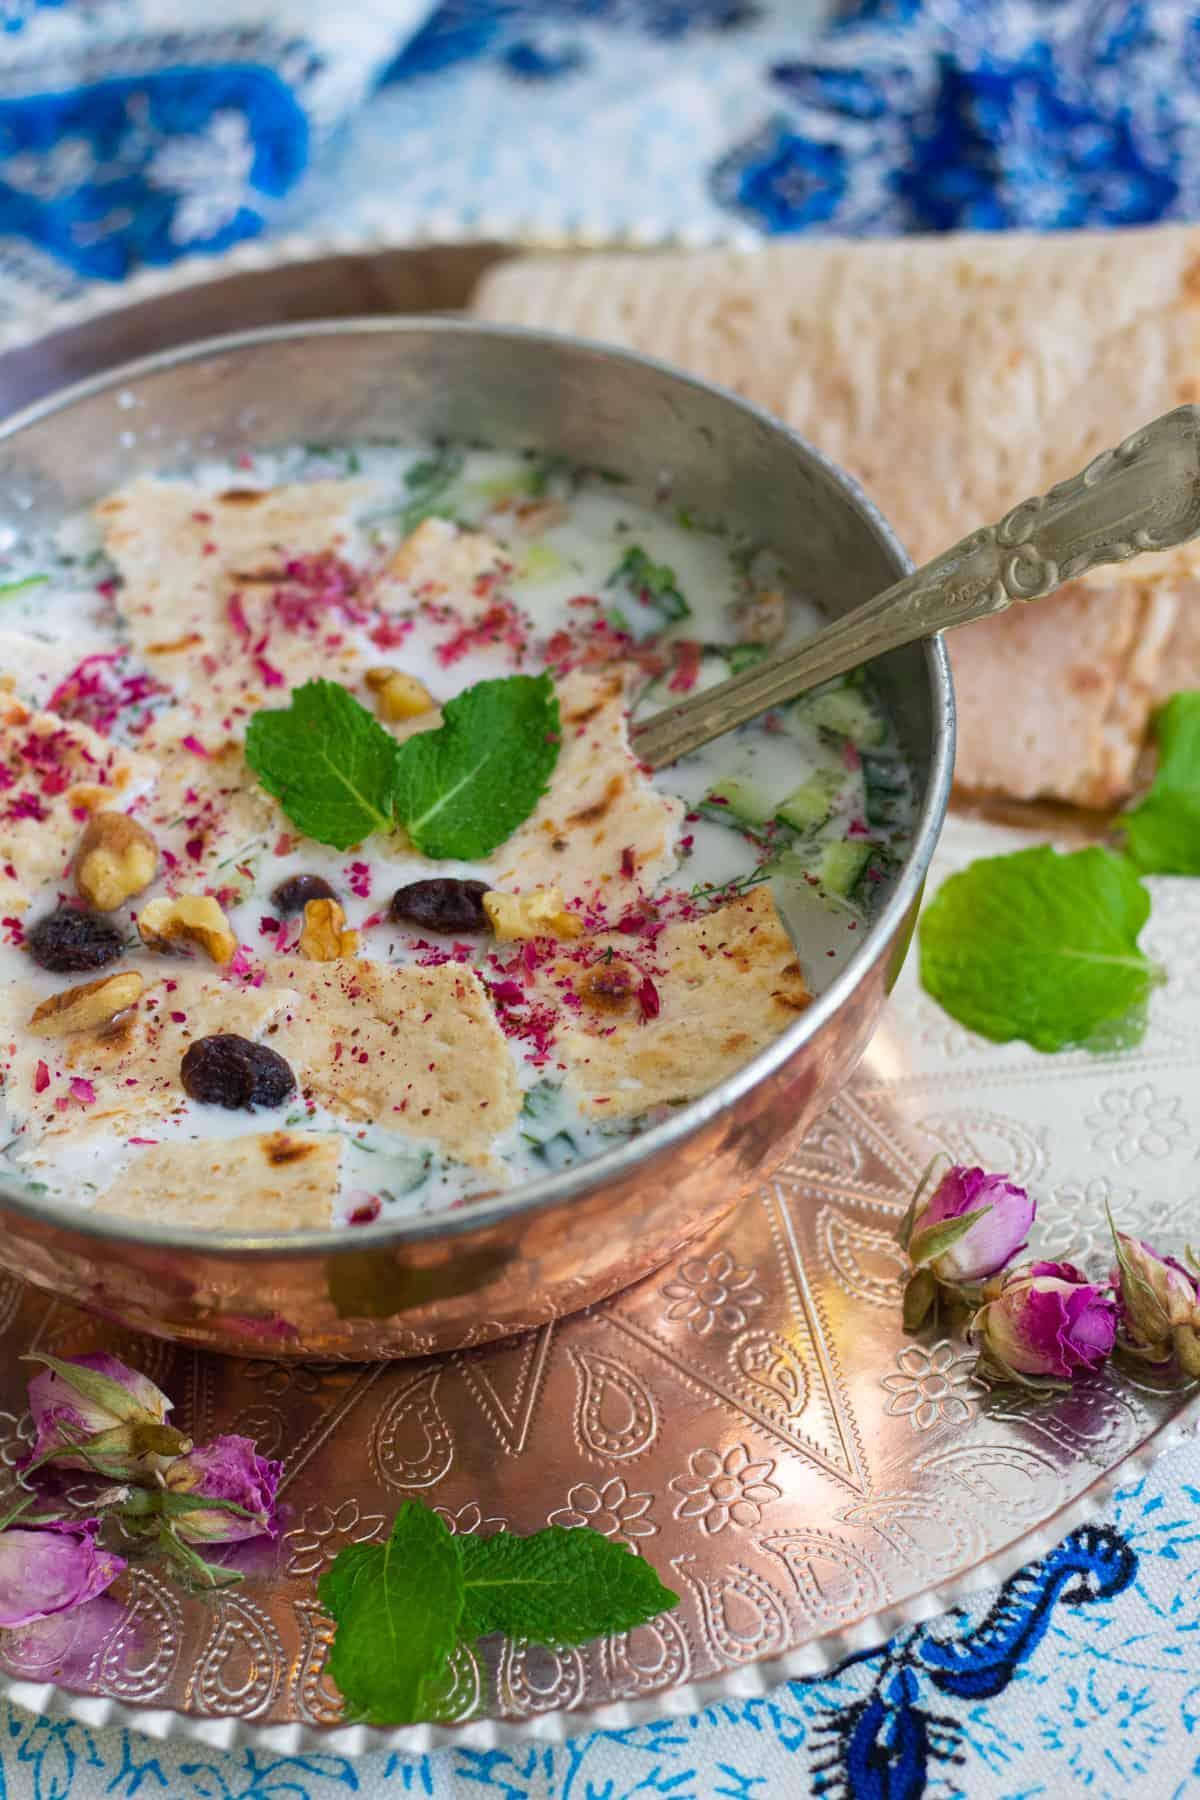 A bowl of yogurt soup with walnuts.